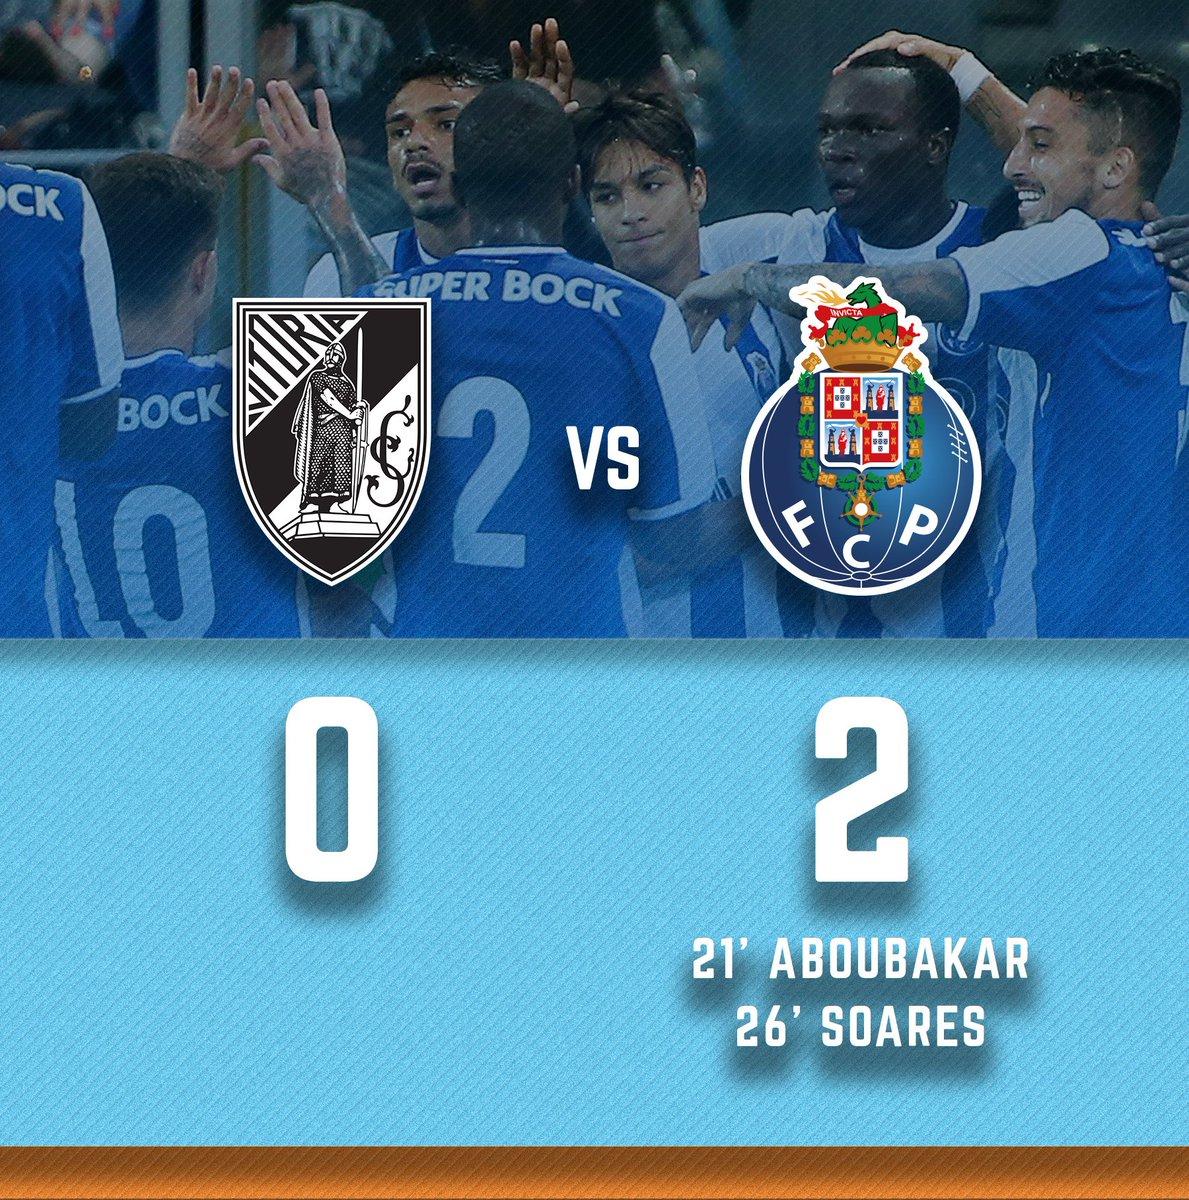 Vitória SC 0-2 FC Porto   21' [0-1] Aboubakar ⚽ 26' [0-2] Soares ⚽  #FCPorto #VSCFCP